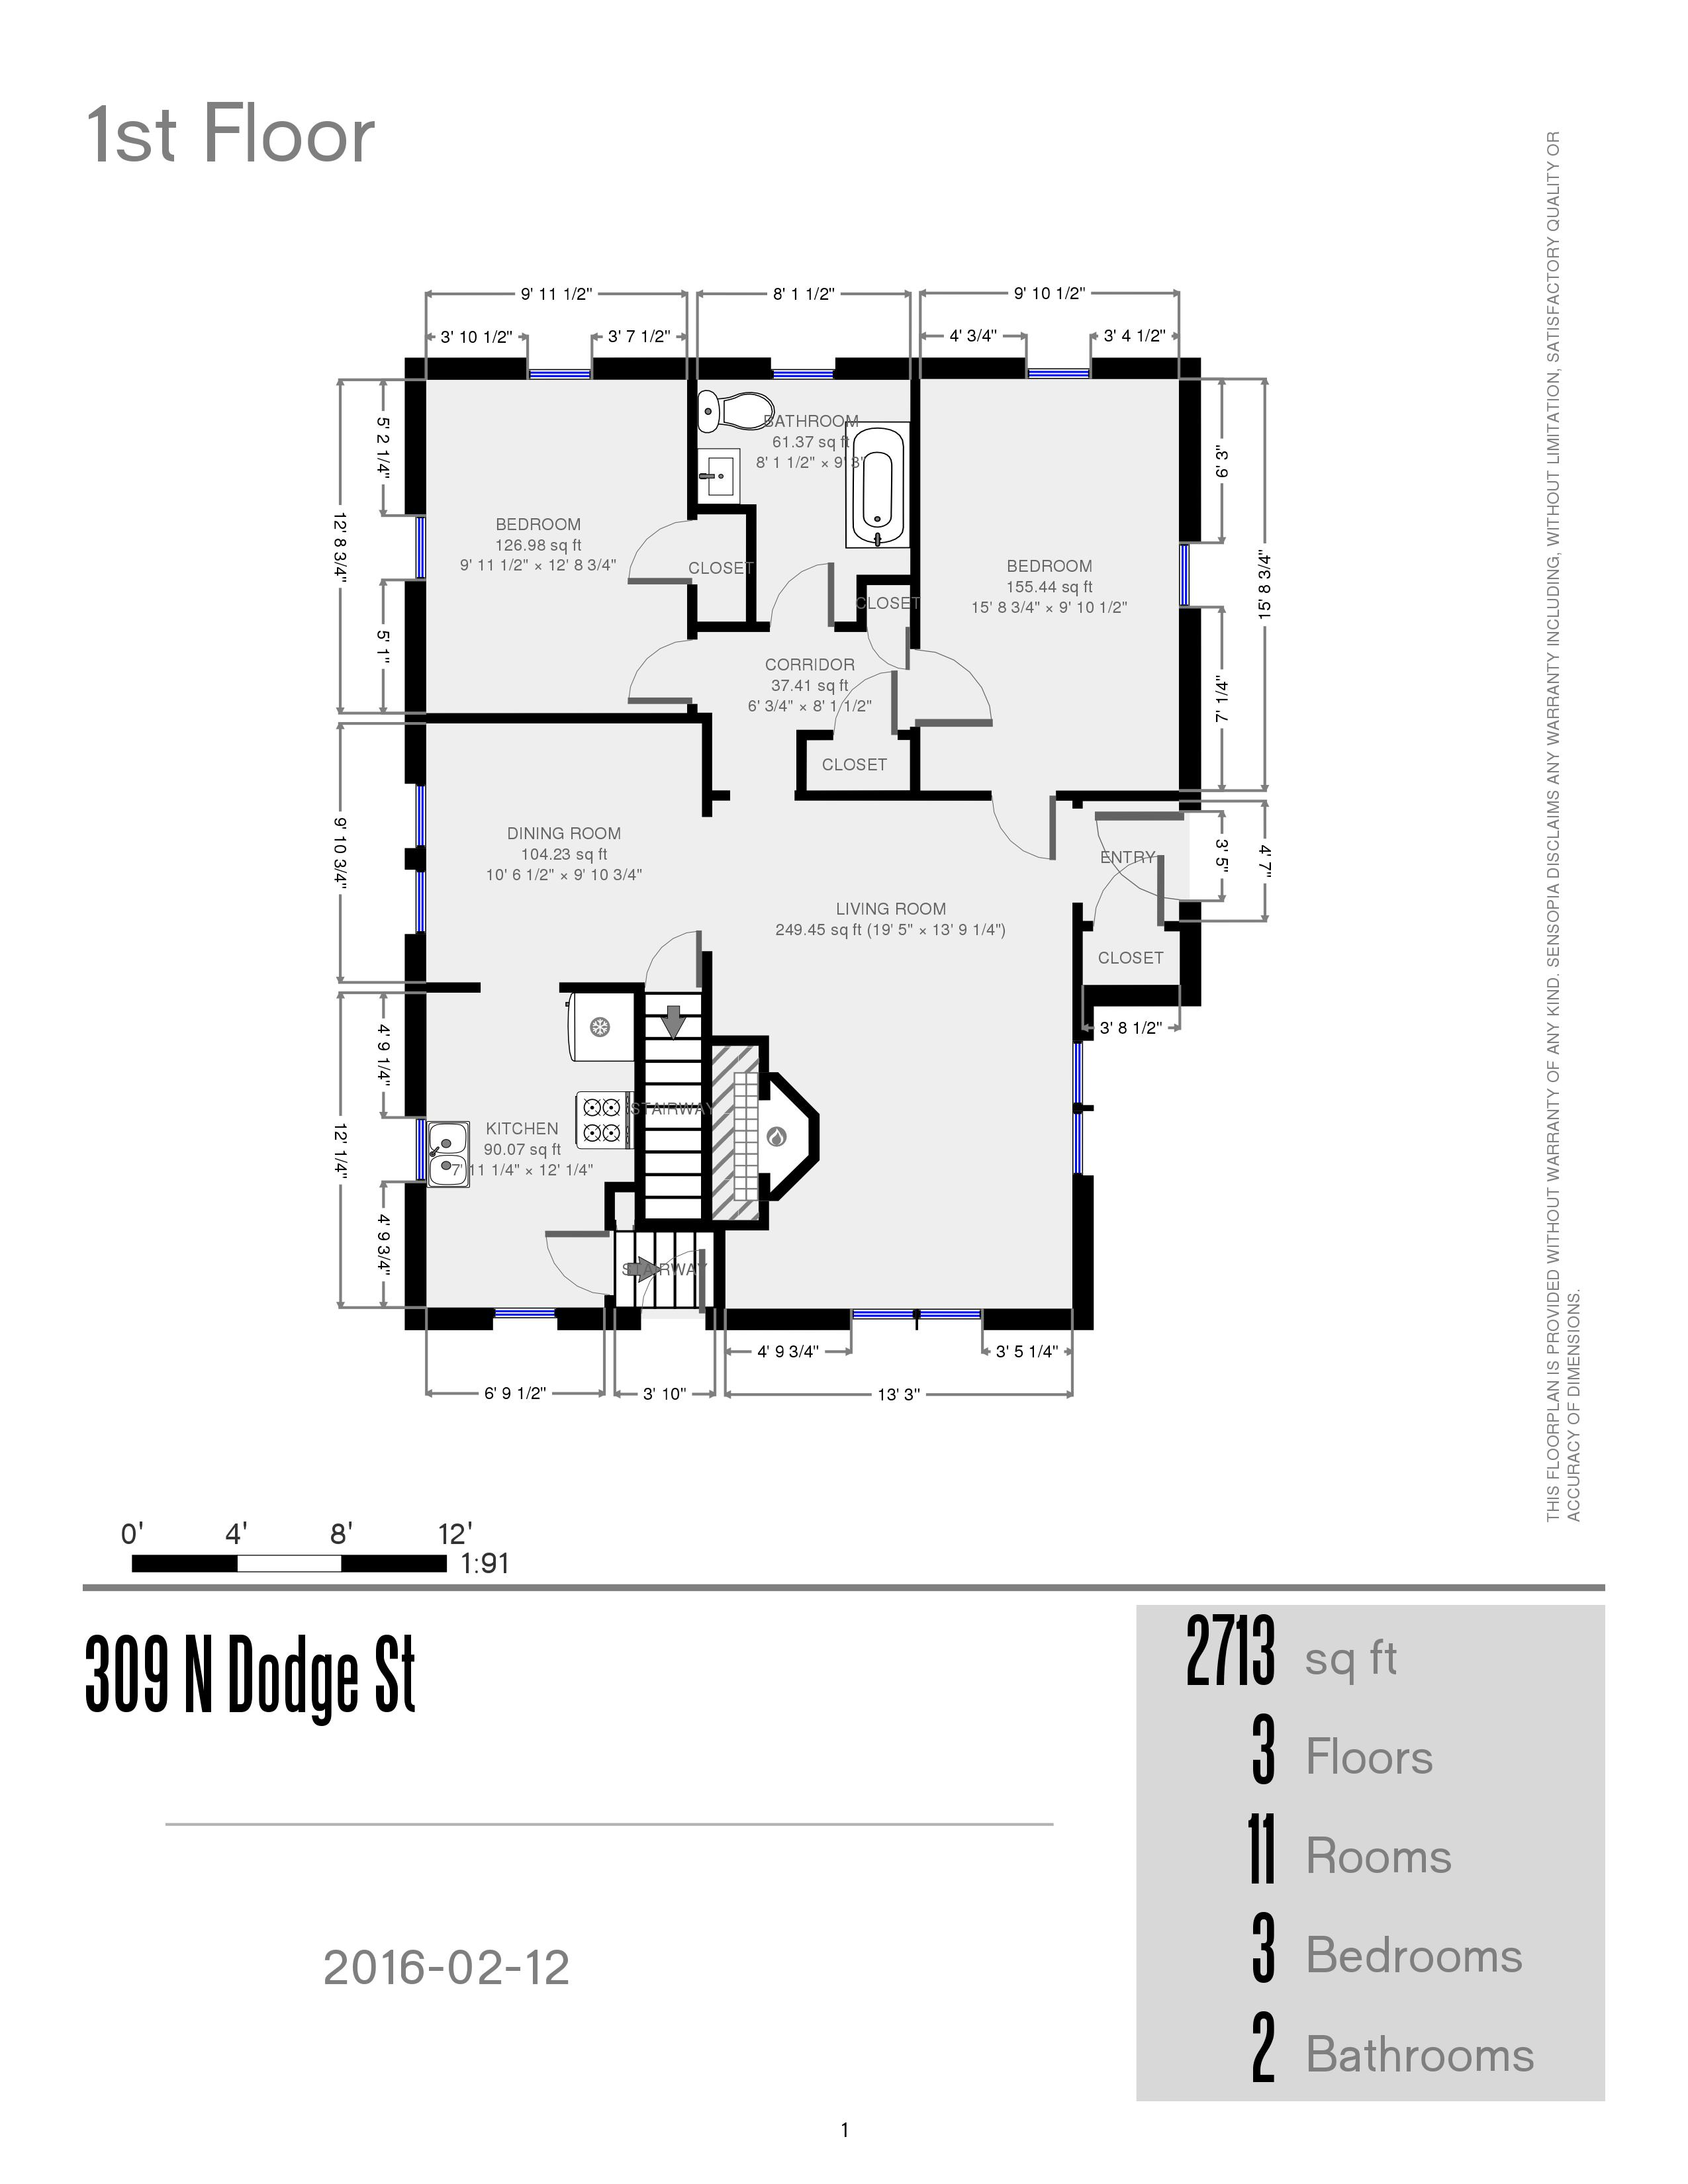 Prestige properties llc 309 n dodge house 3br 2ba for 3br 2ba floor plans